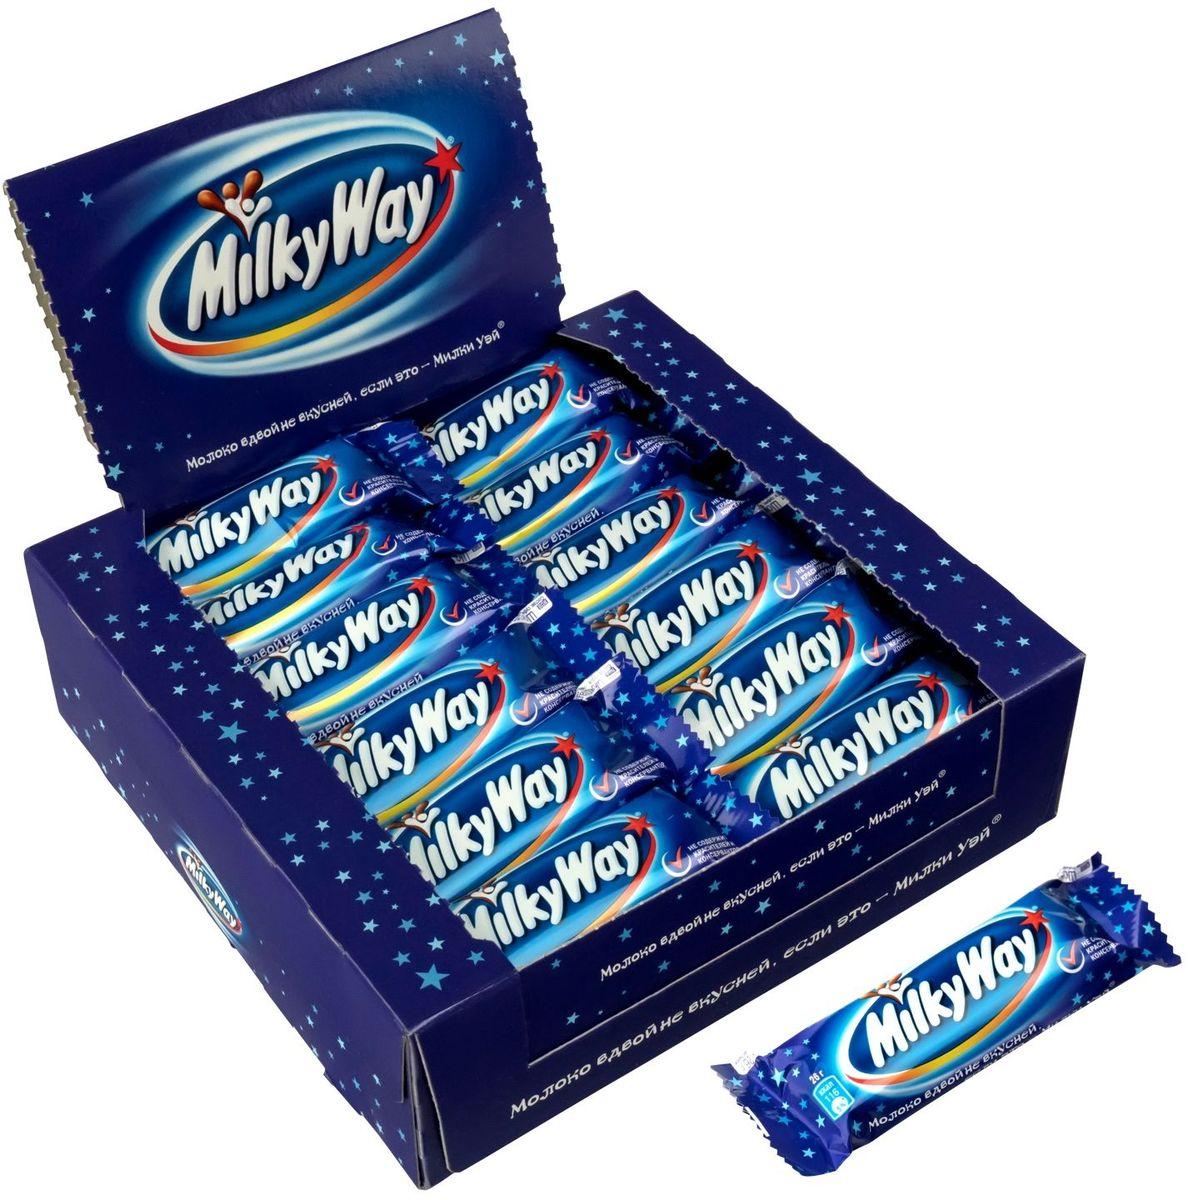 Milky way шоколадный батончик, 36 шт по 26 г